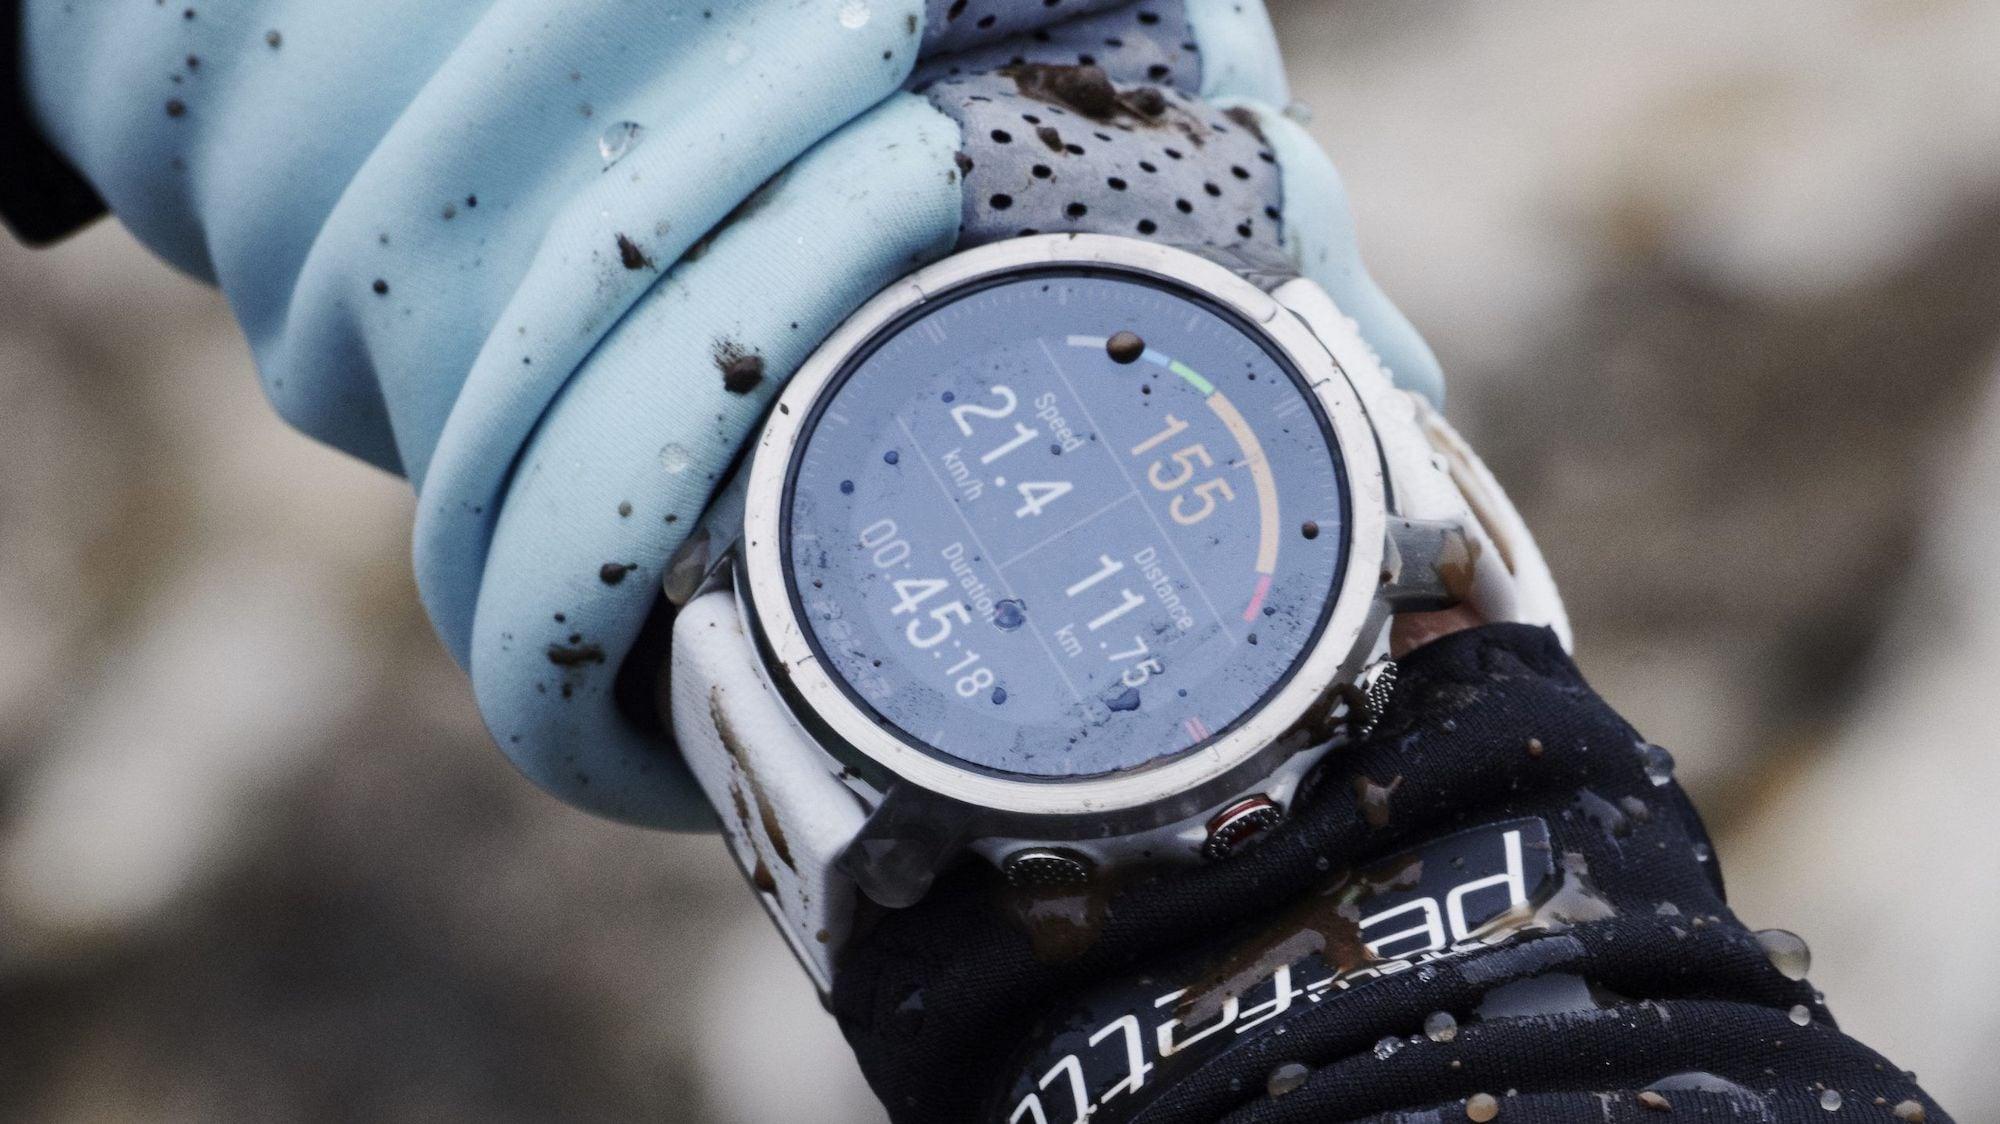 Polar Grit X Outdoor Multisport Watch